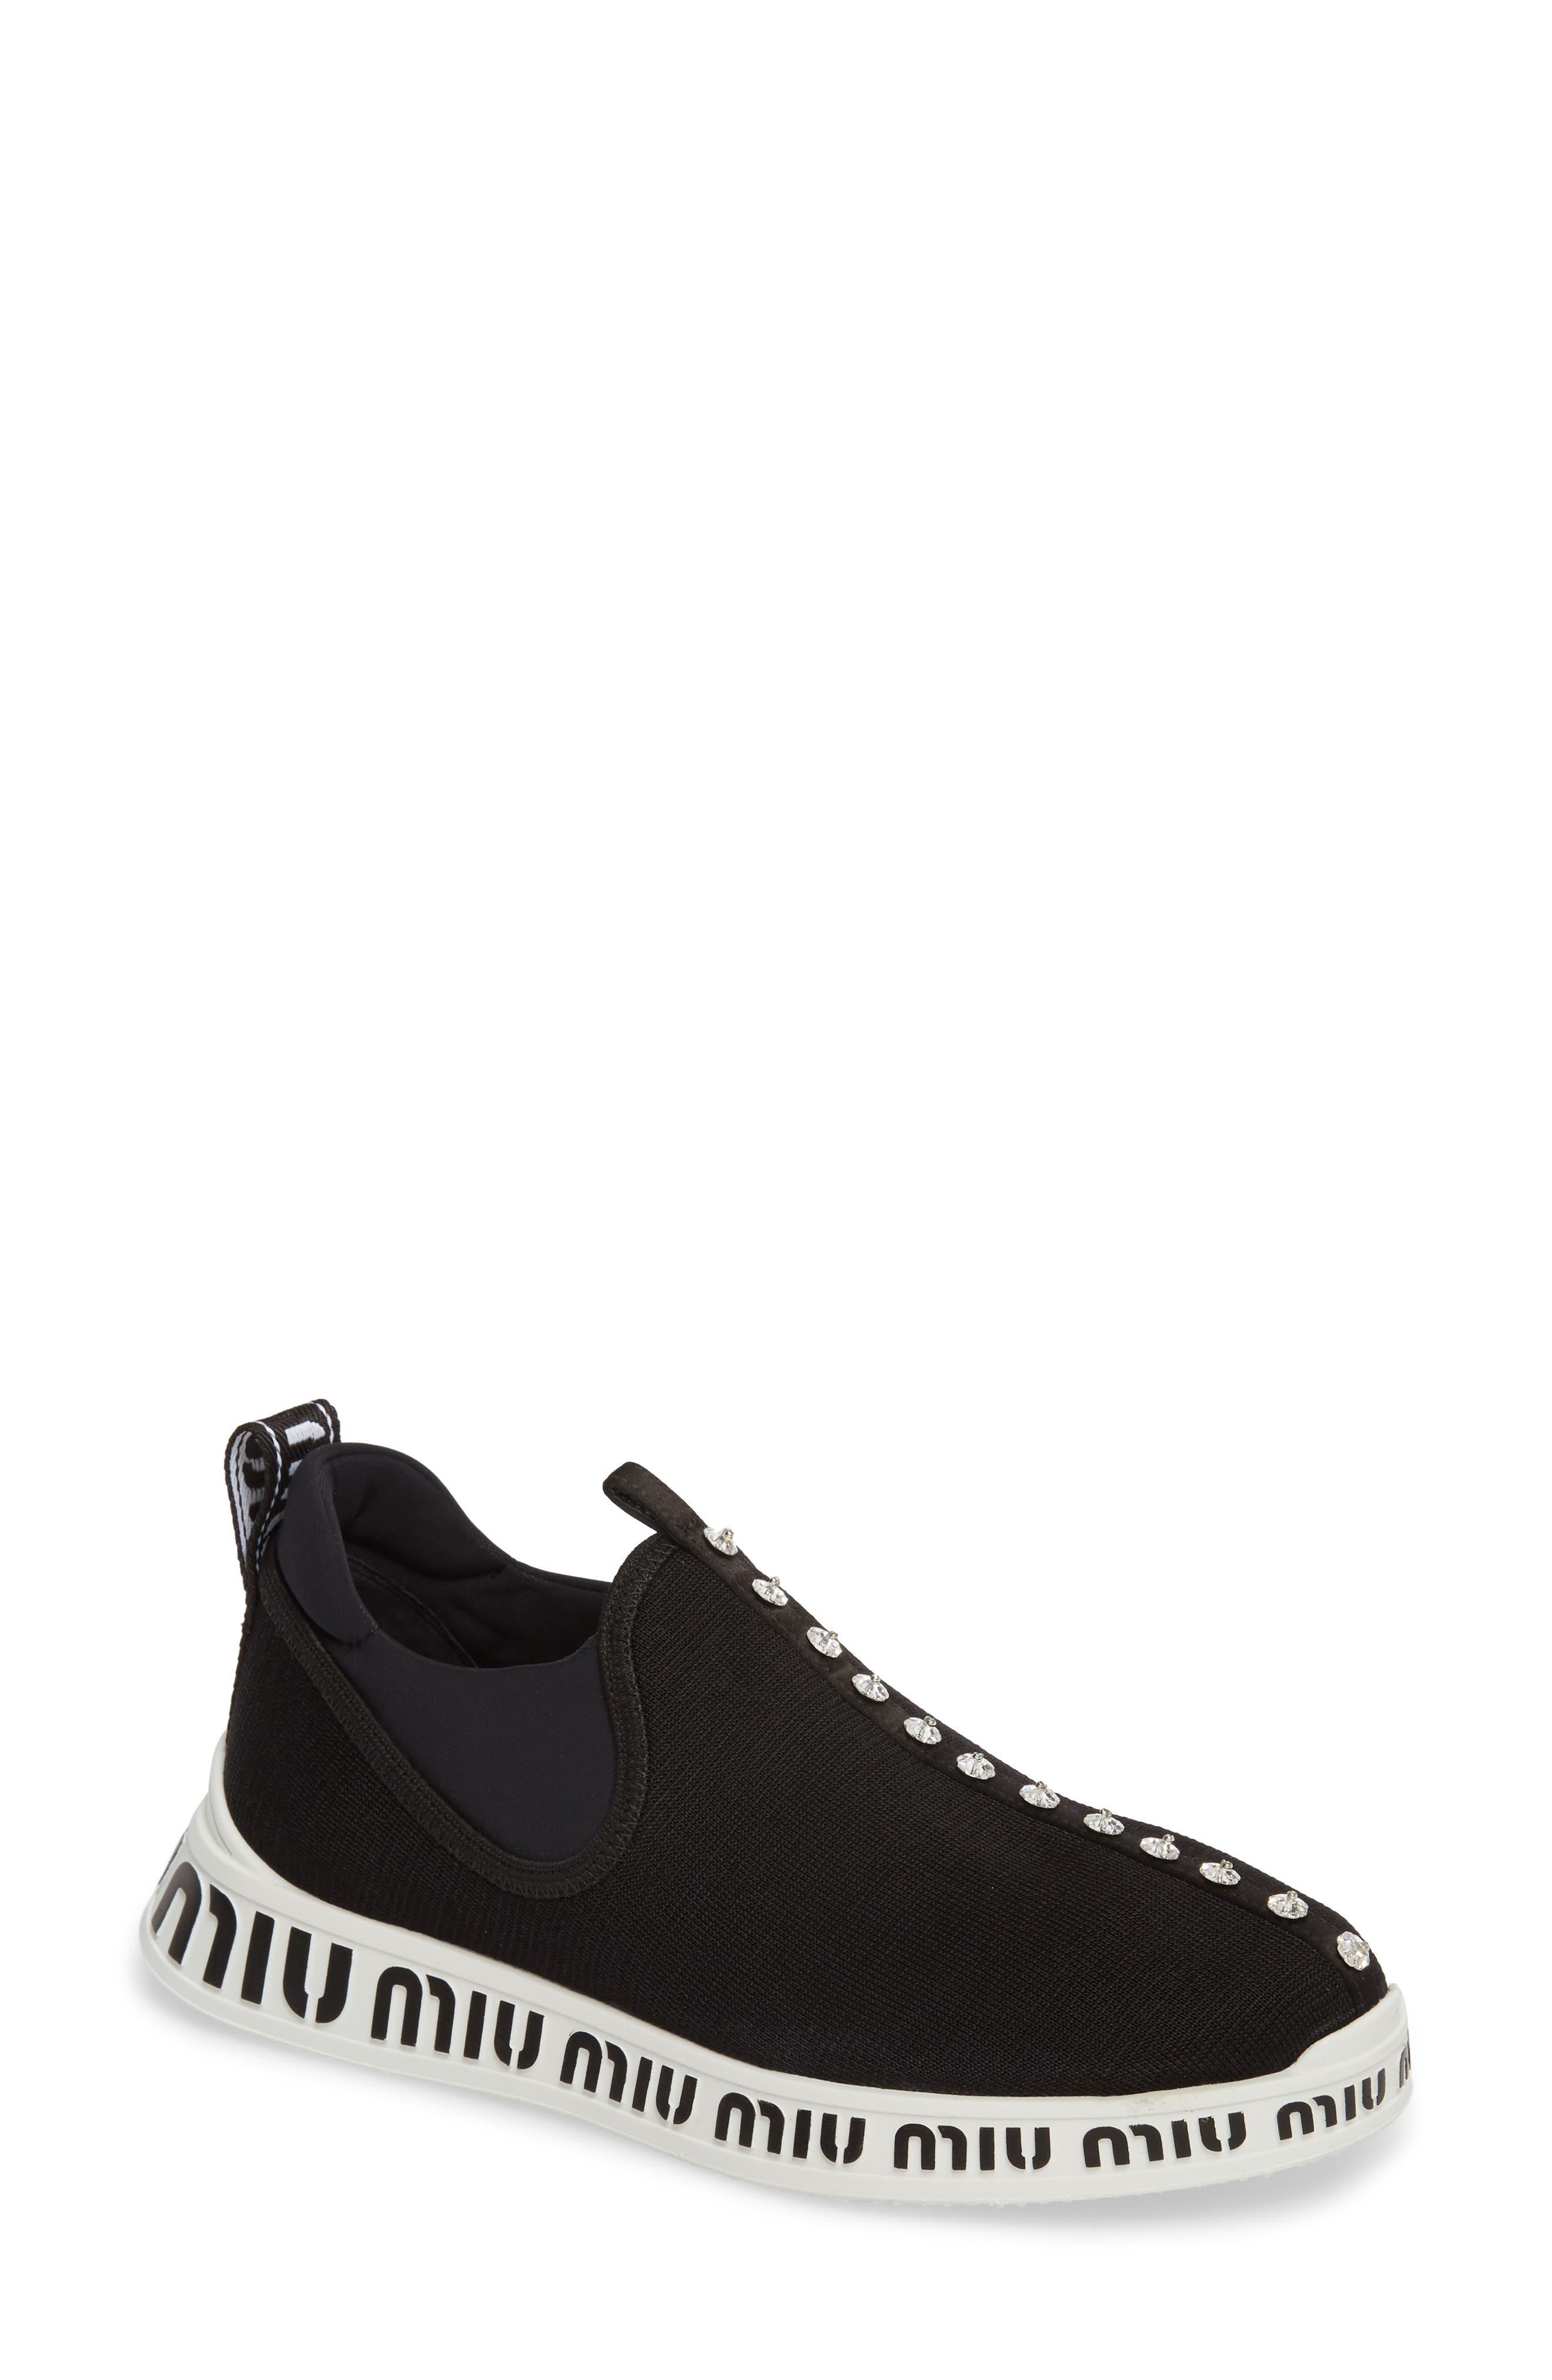 Miu Miu Logo Slip-On Sneaker - Black